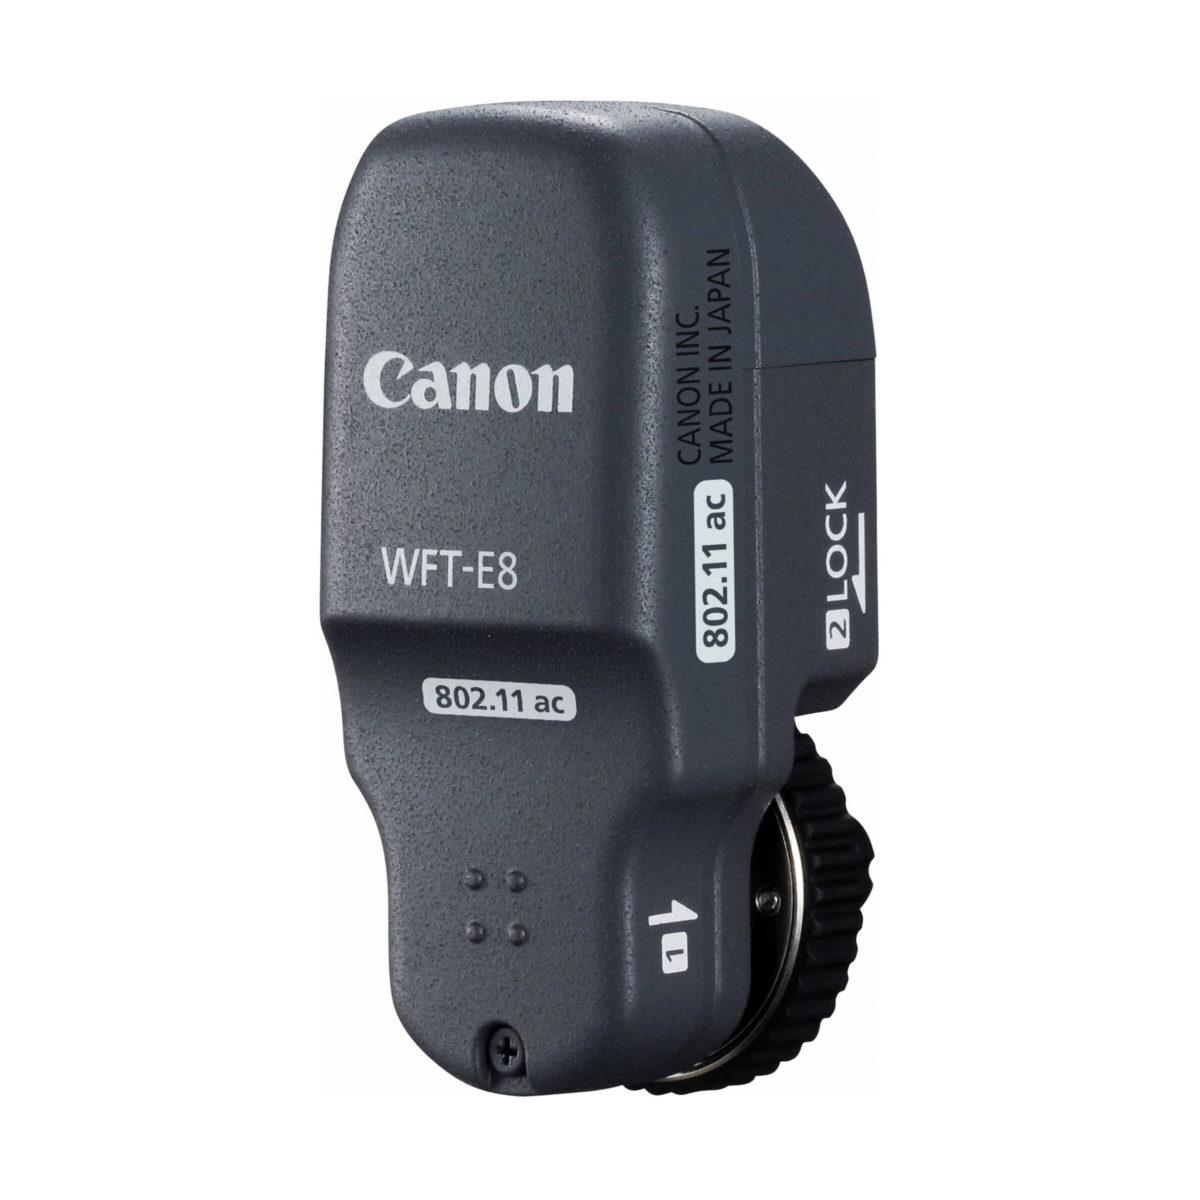 canon_wireless_file_transmitter_wft_e8_02